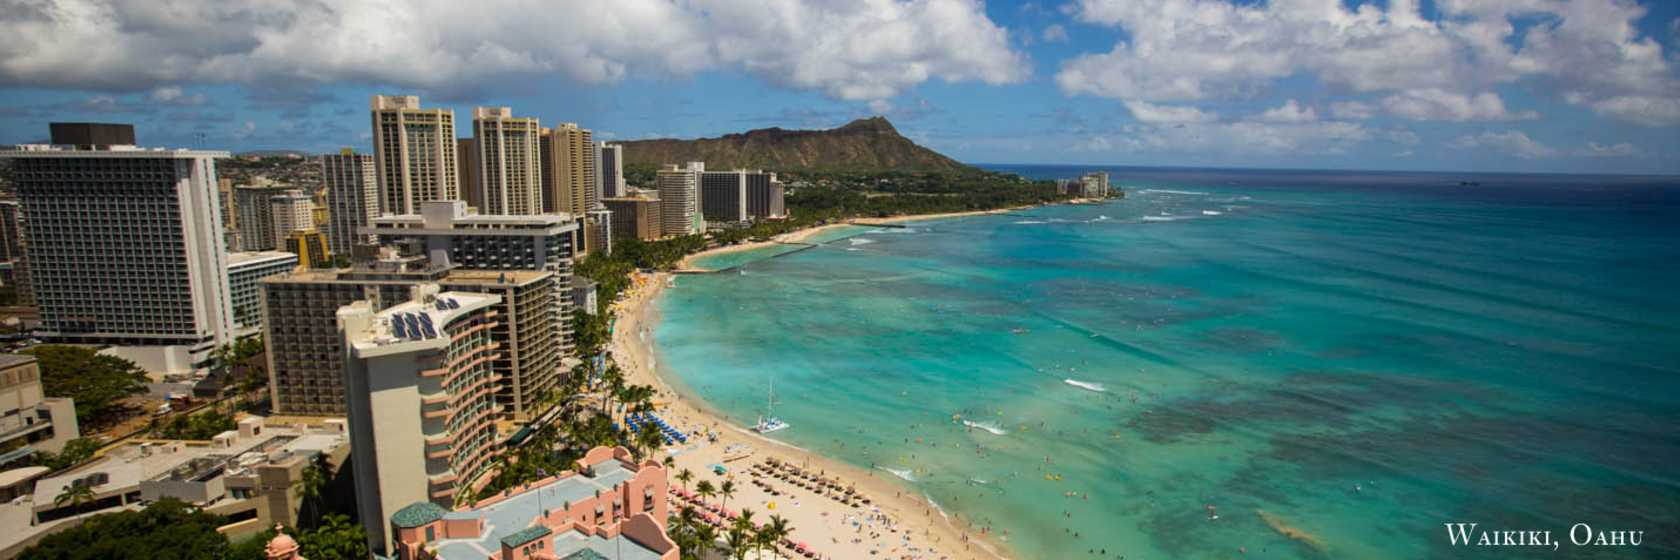 Oahu - Waikiki